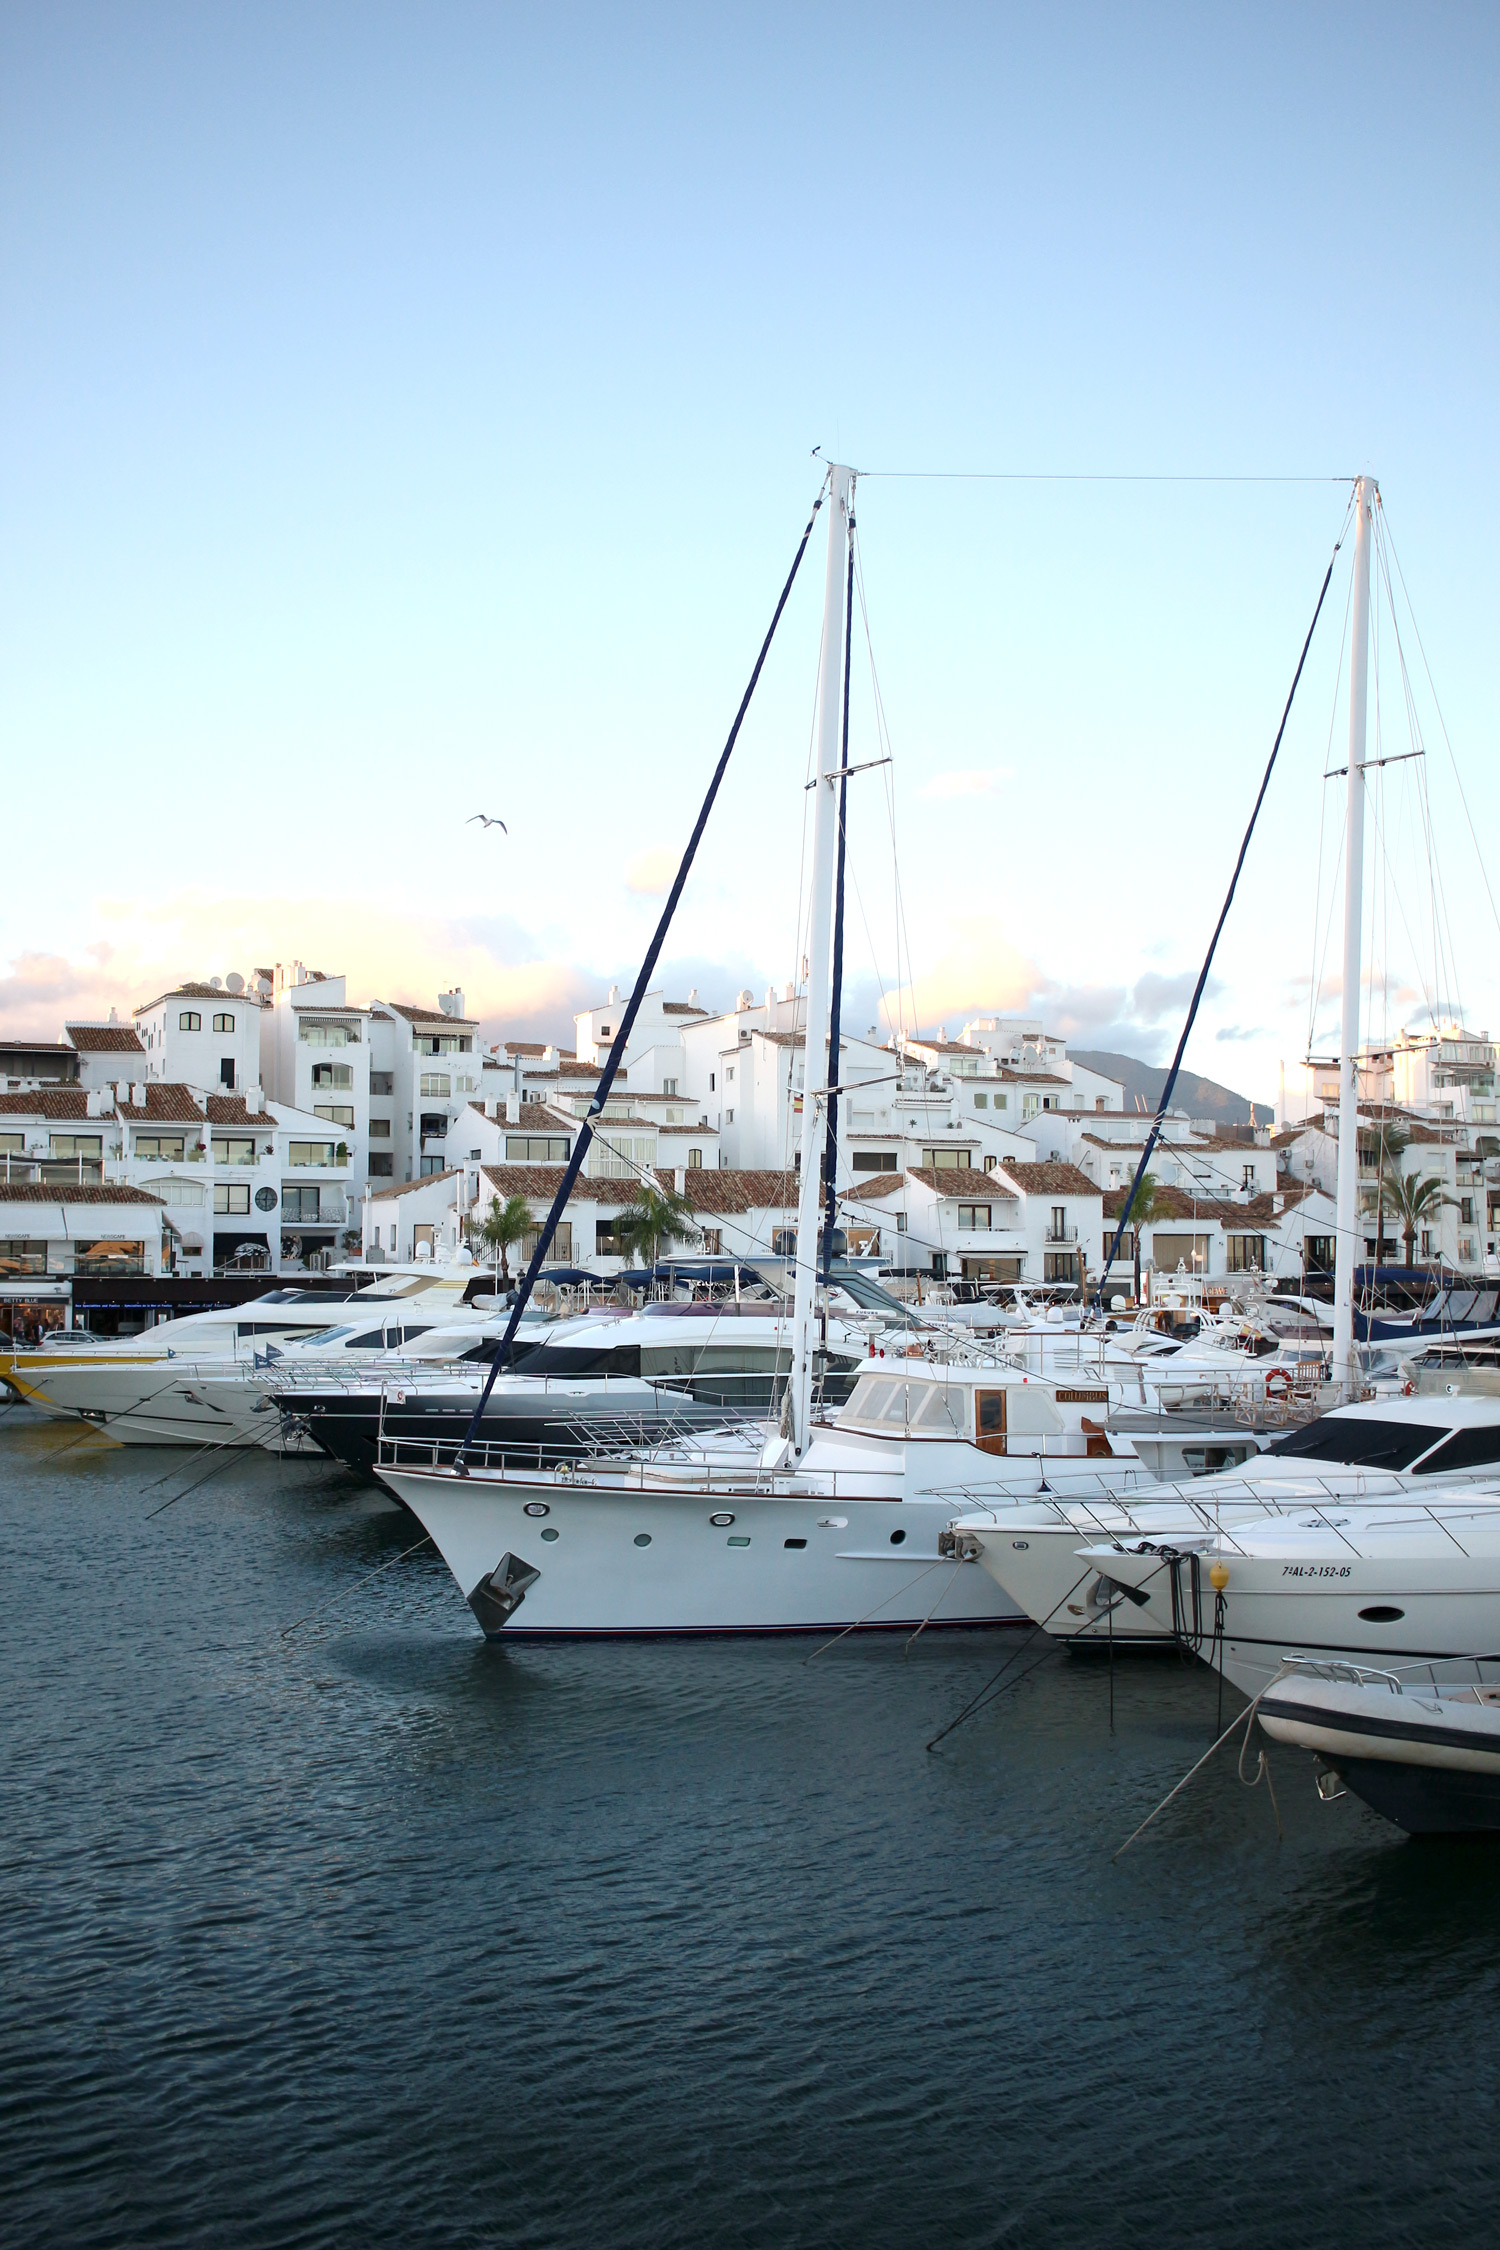 marbella-malaga-spain-travel-blogger-Puerto-Banus-6